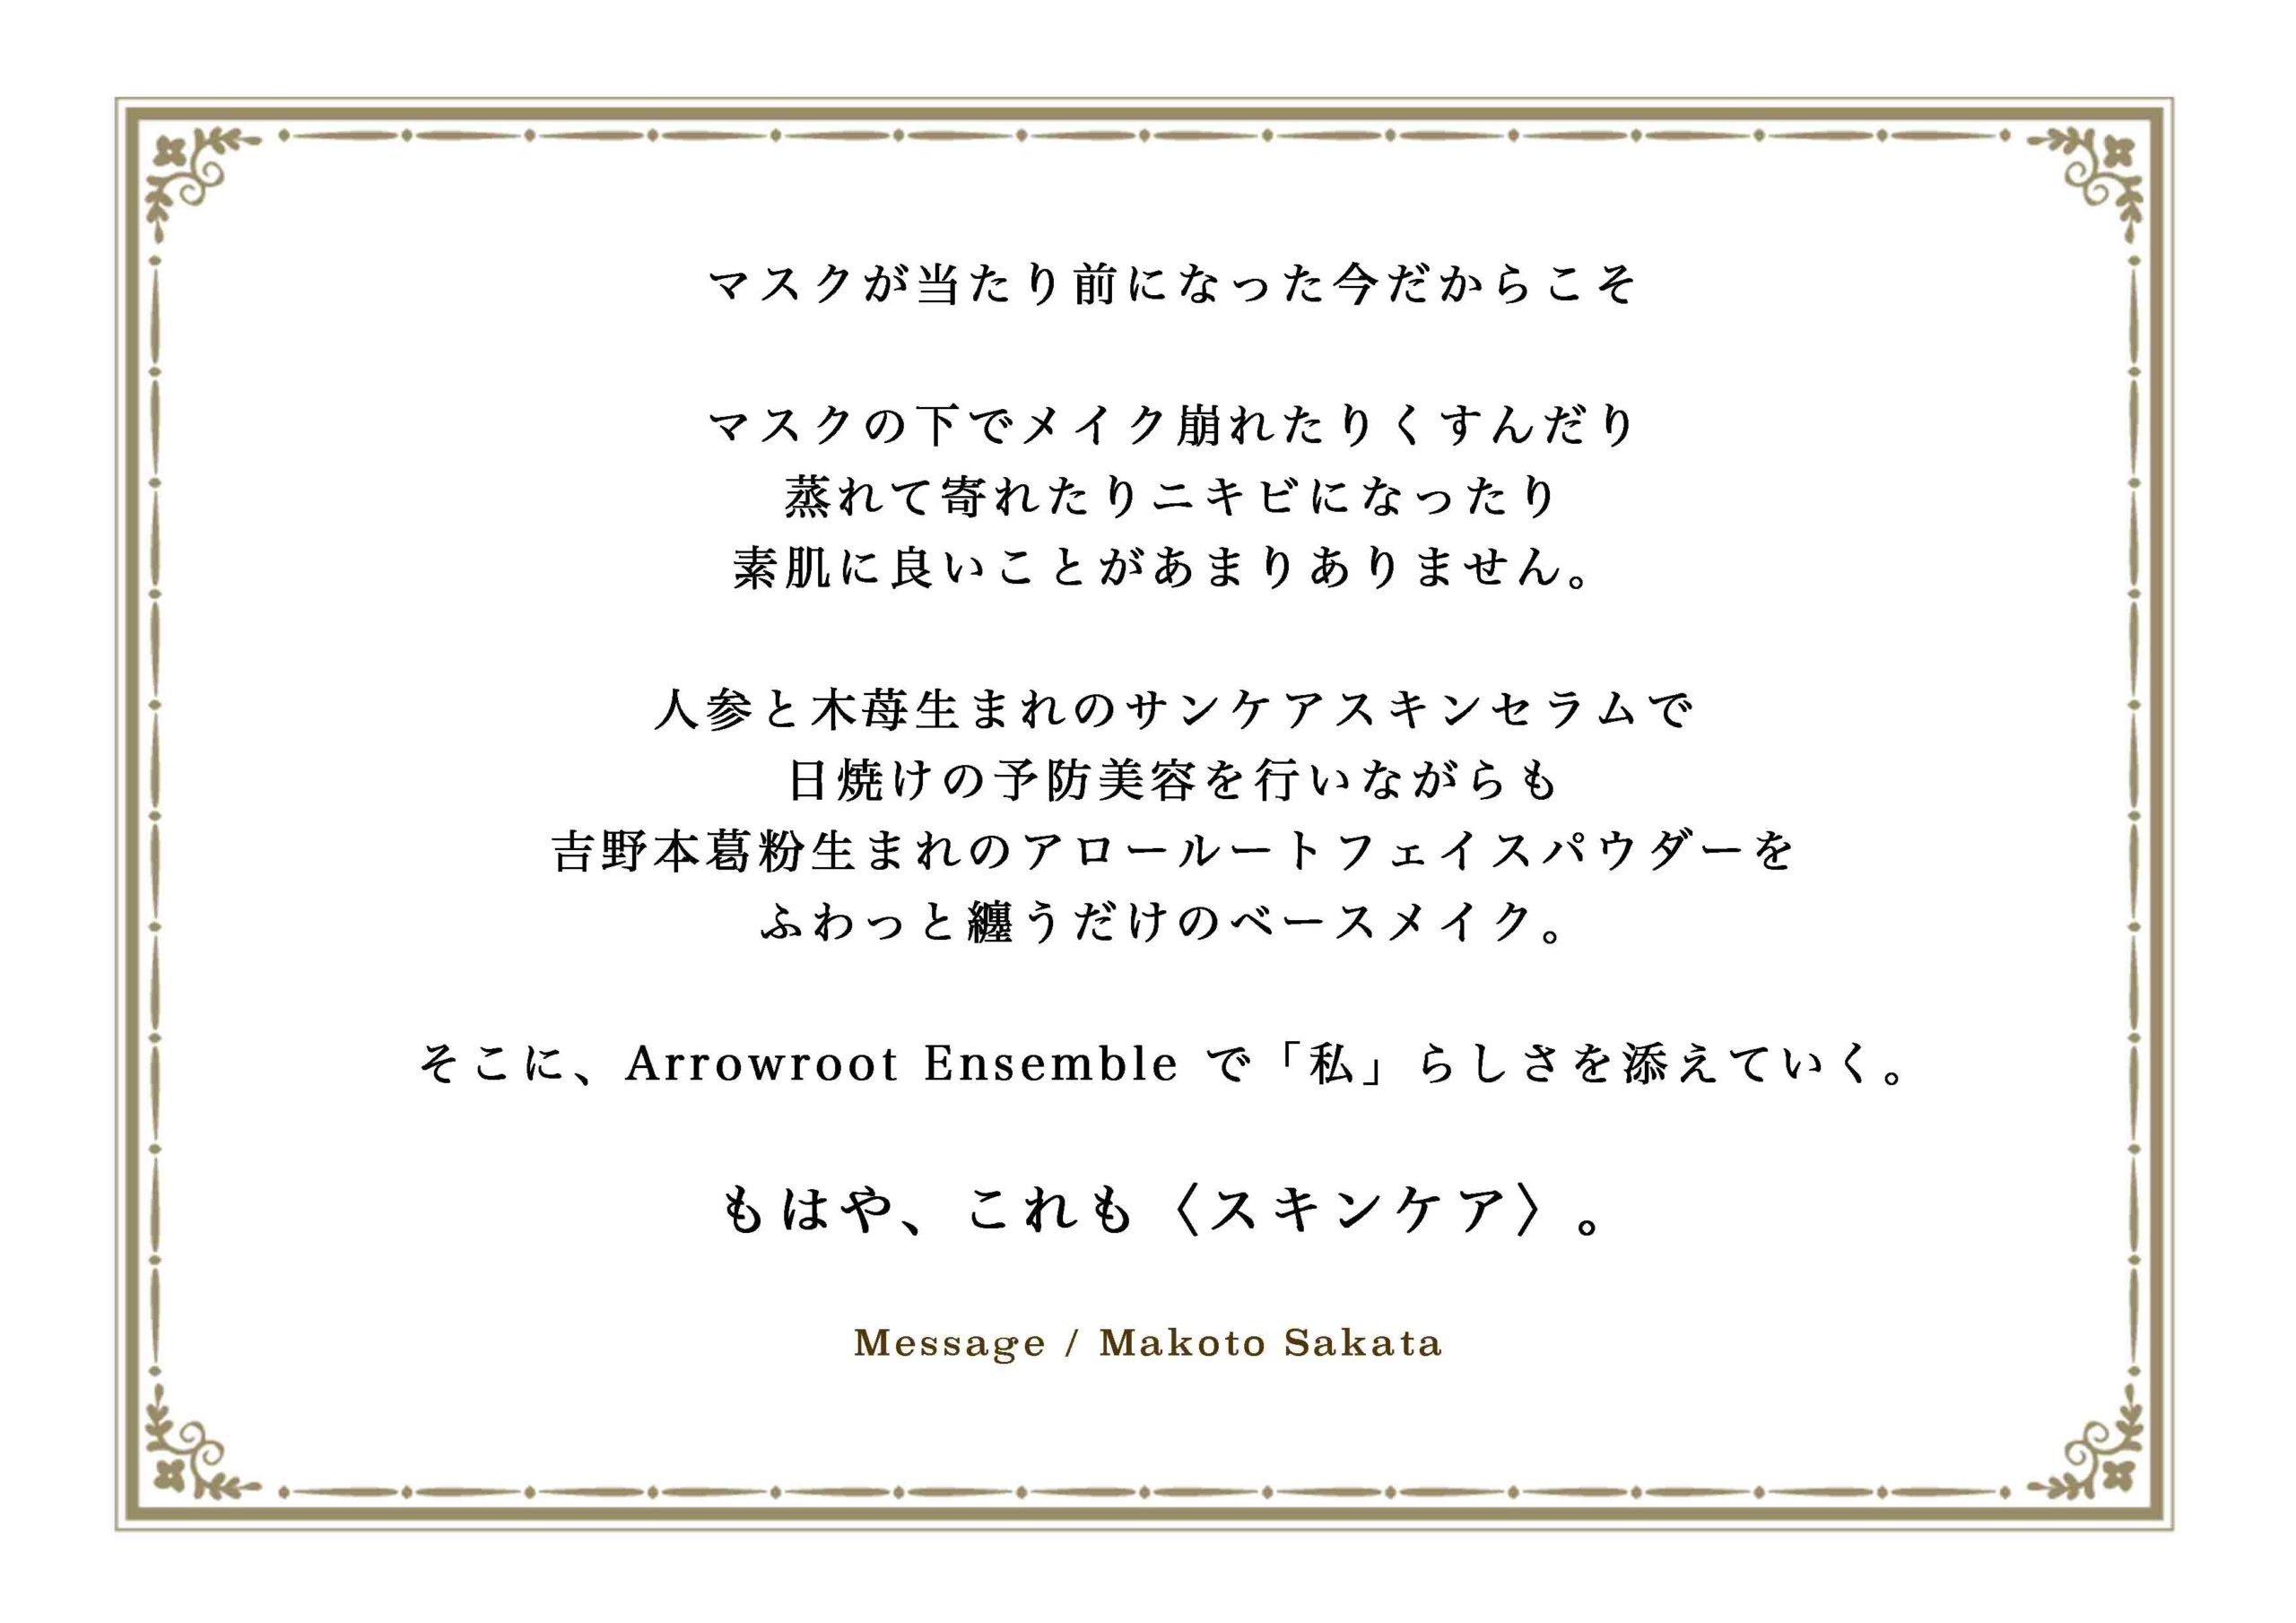 Arrowroot Ensemble 10